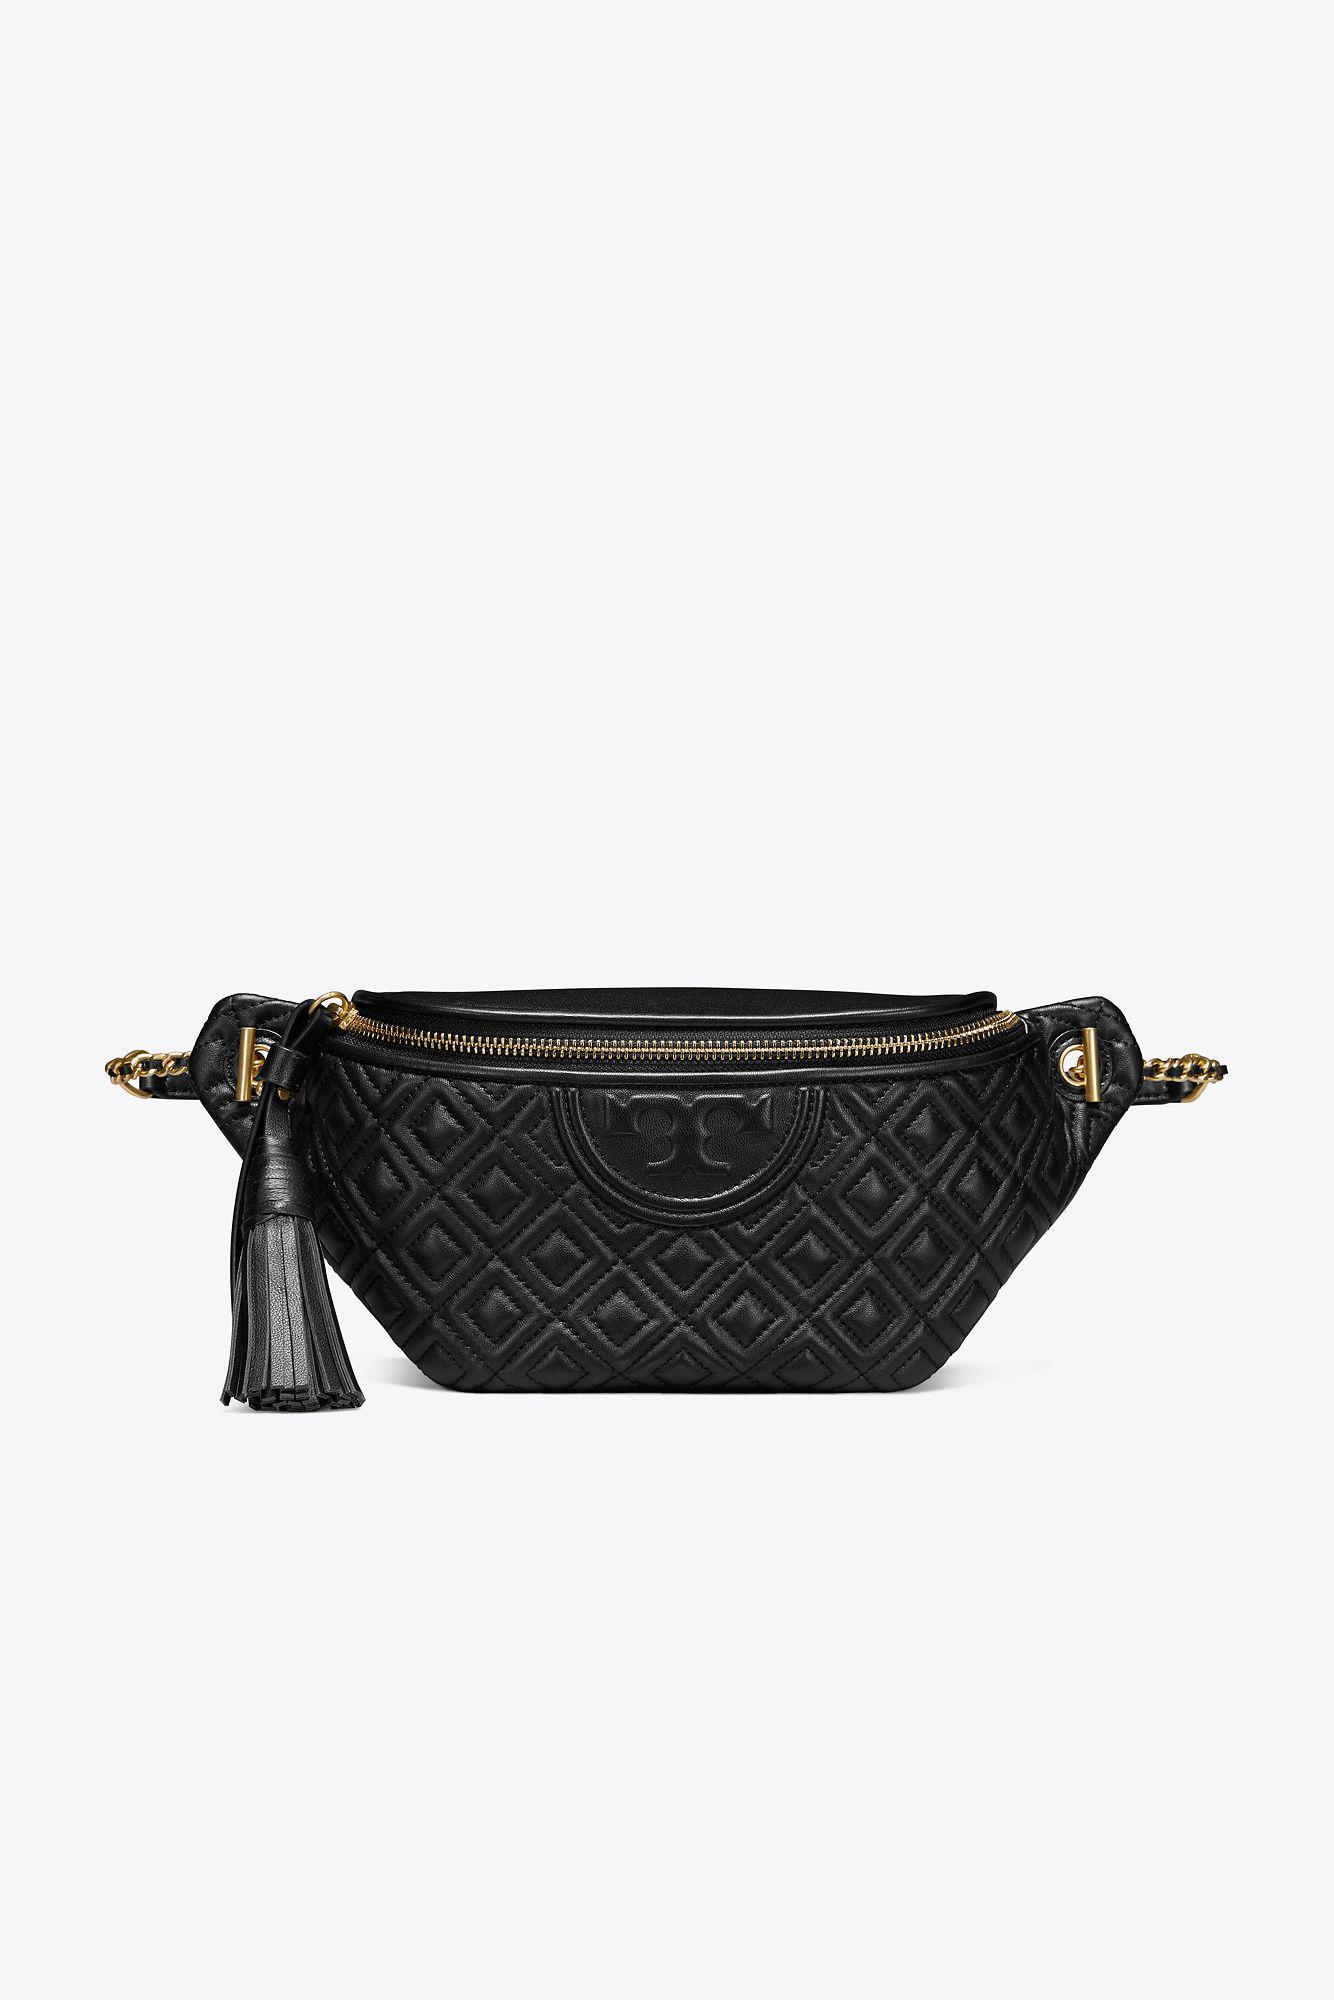 fd37510dc35 Lyst - Tory Burch Fleming Belt Bag in Black